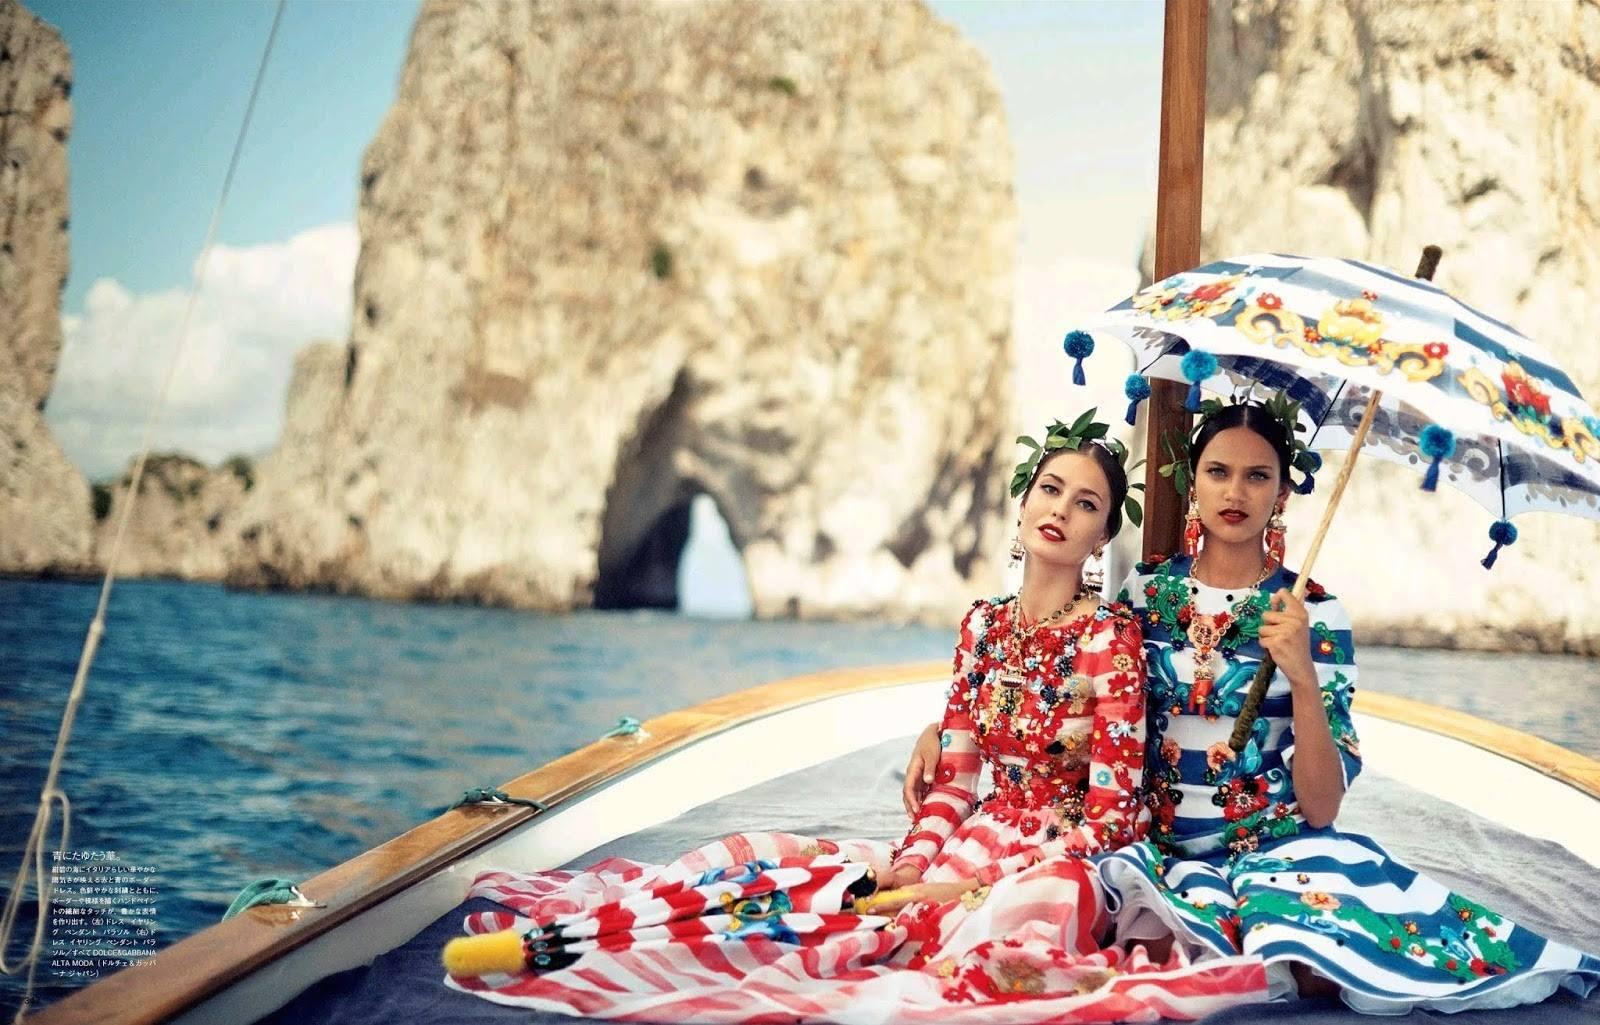 Dal servizio fotografico Dolce e Gabbana a Capri. Fonte: Vogue japan 2014 Capri country-magazines.blogspot.com